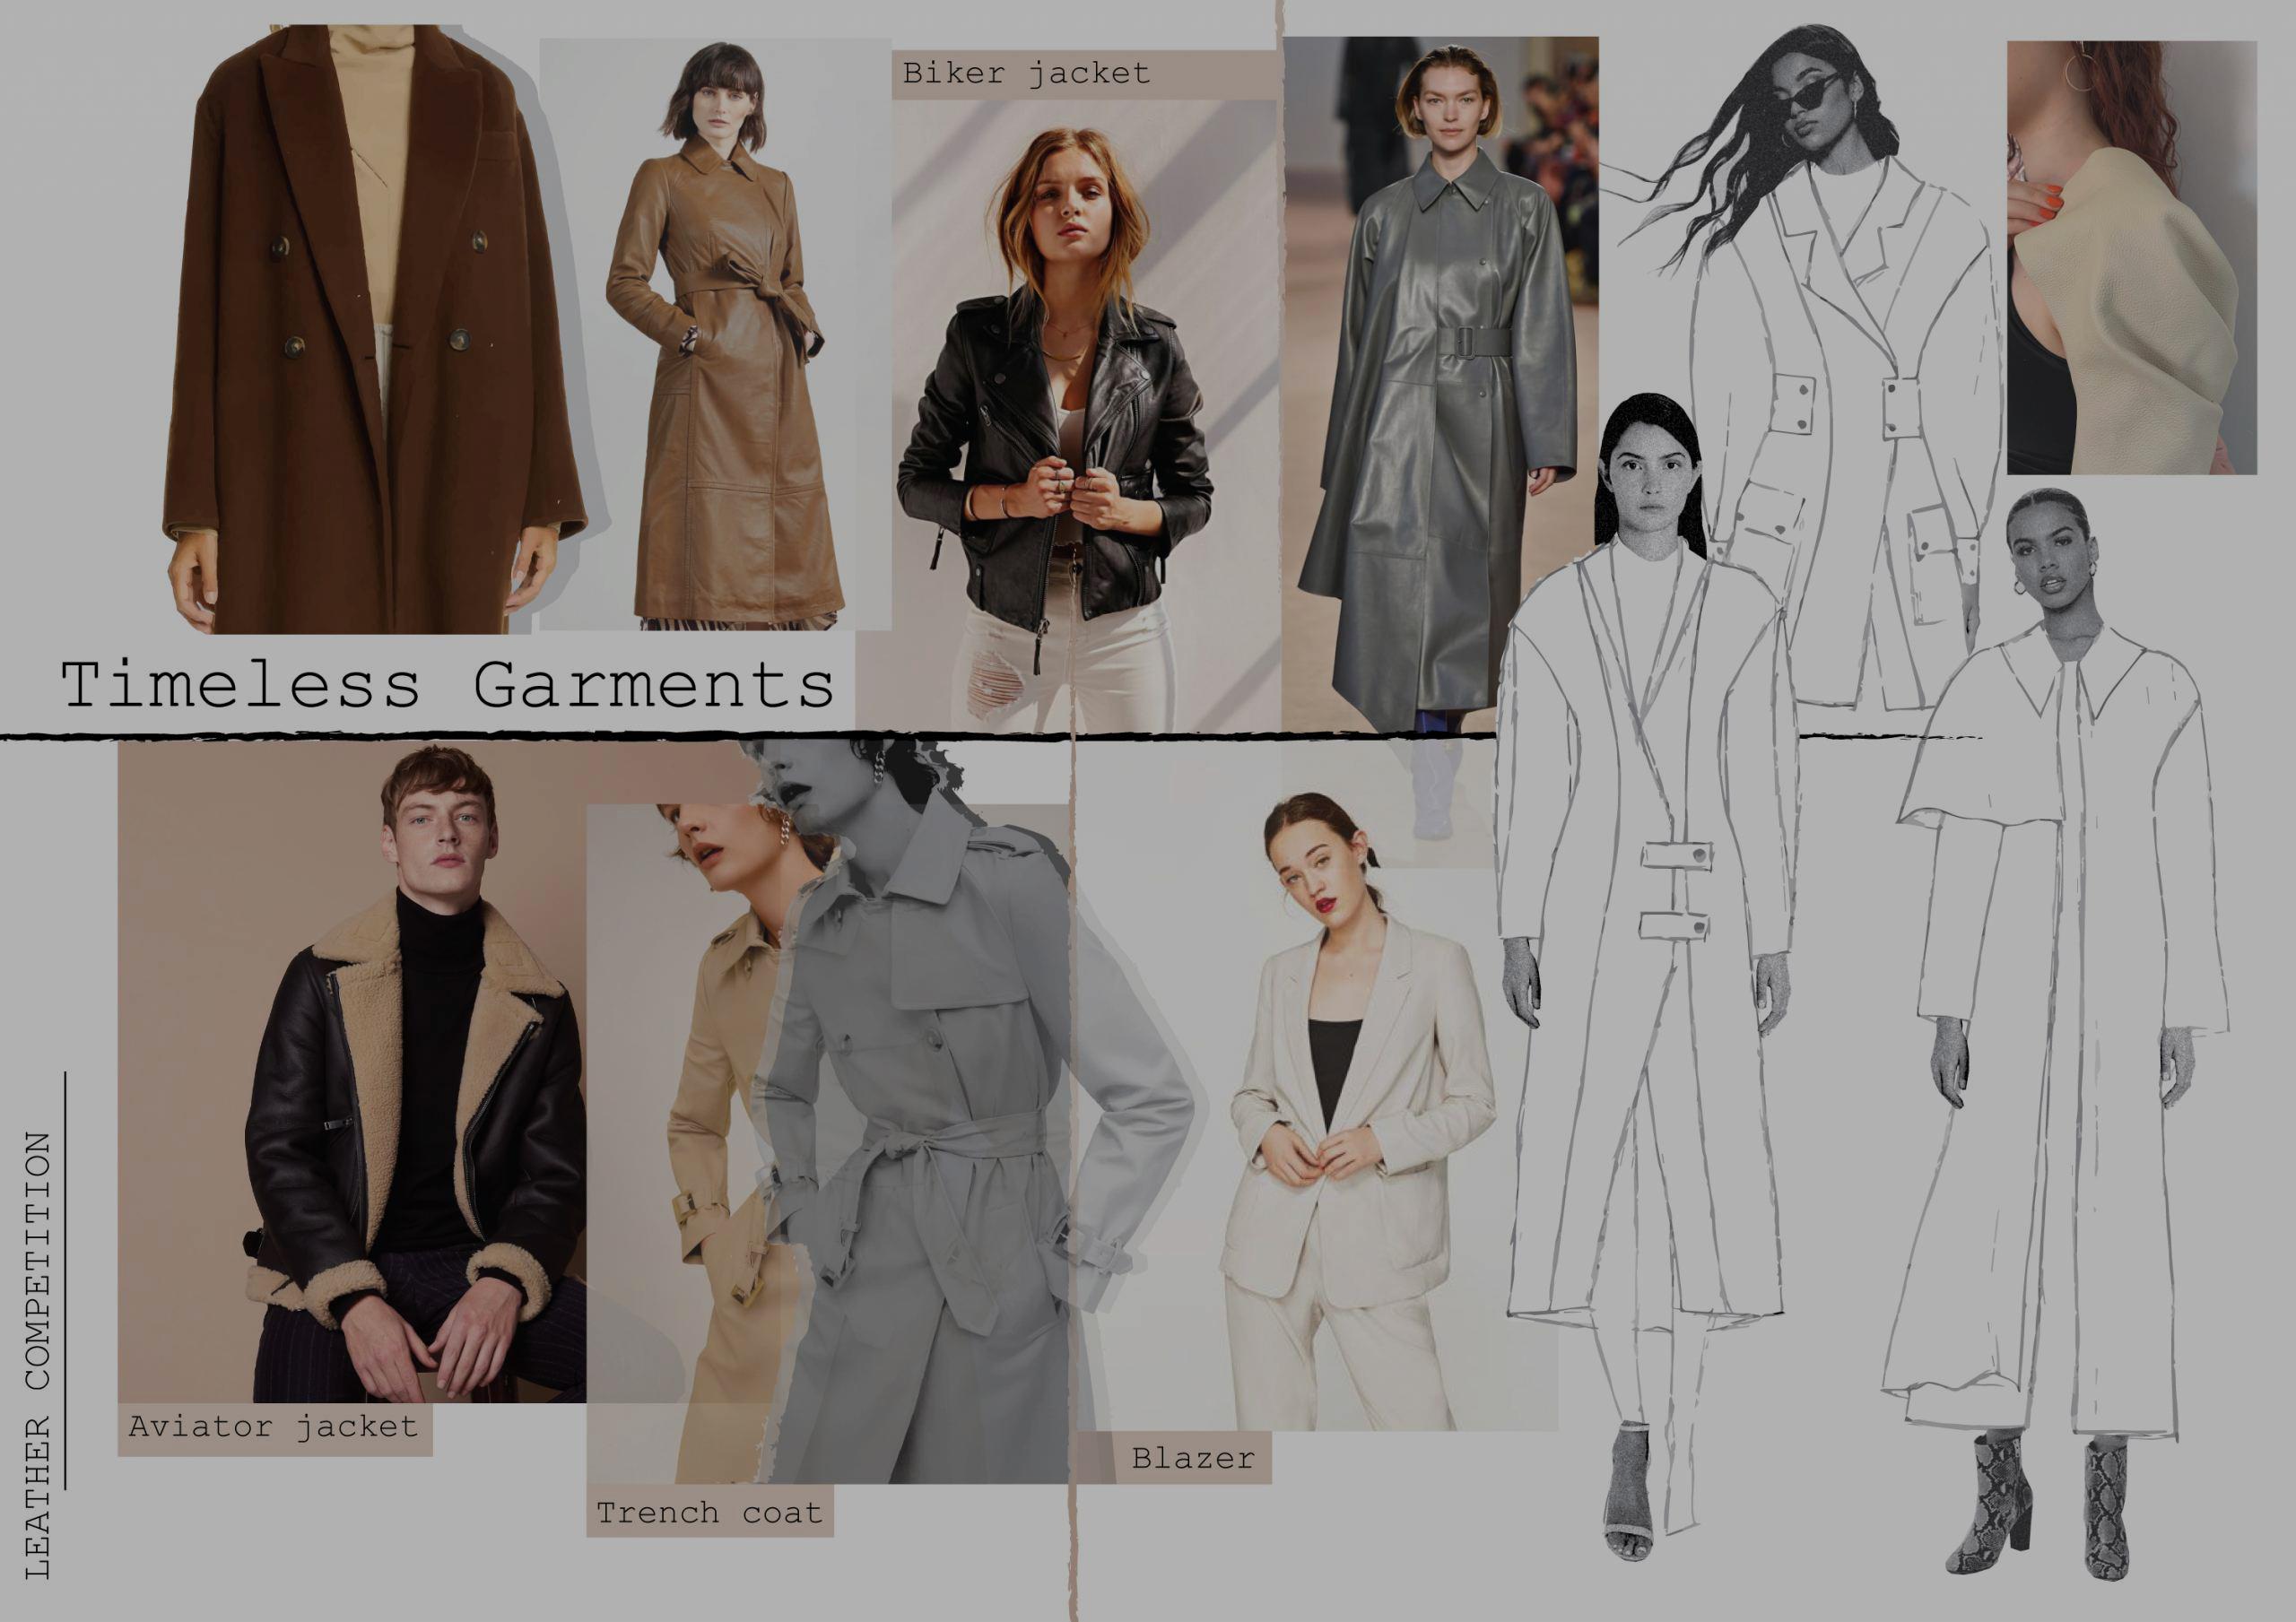 International Student Design Competition Finalist Profile: Chloe Twigg